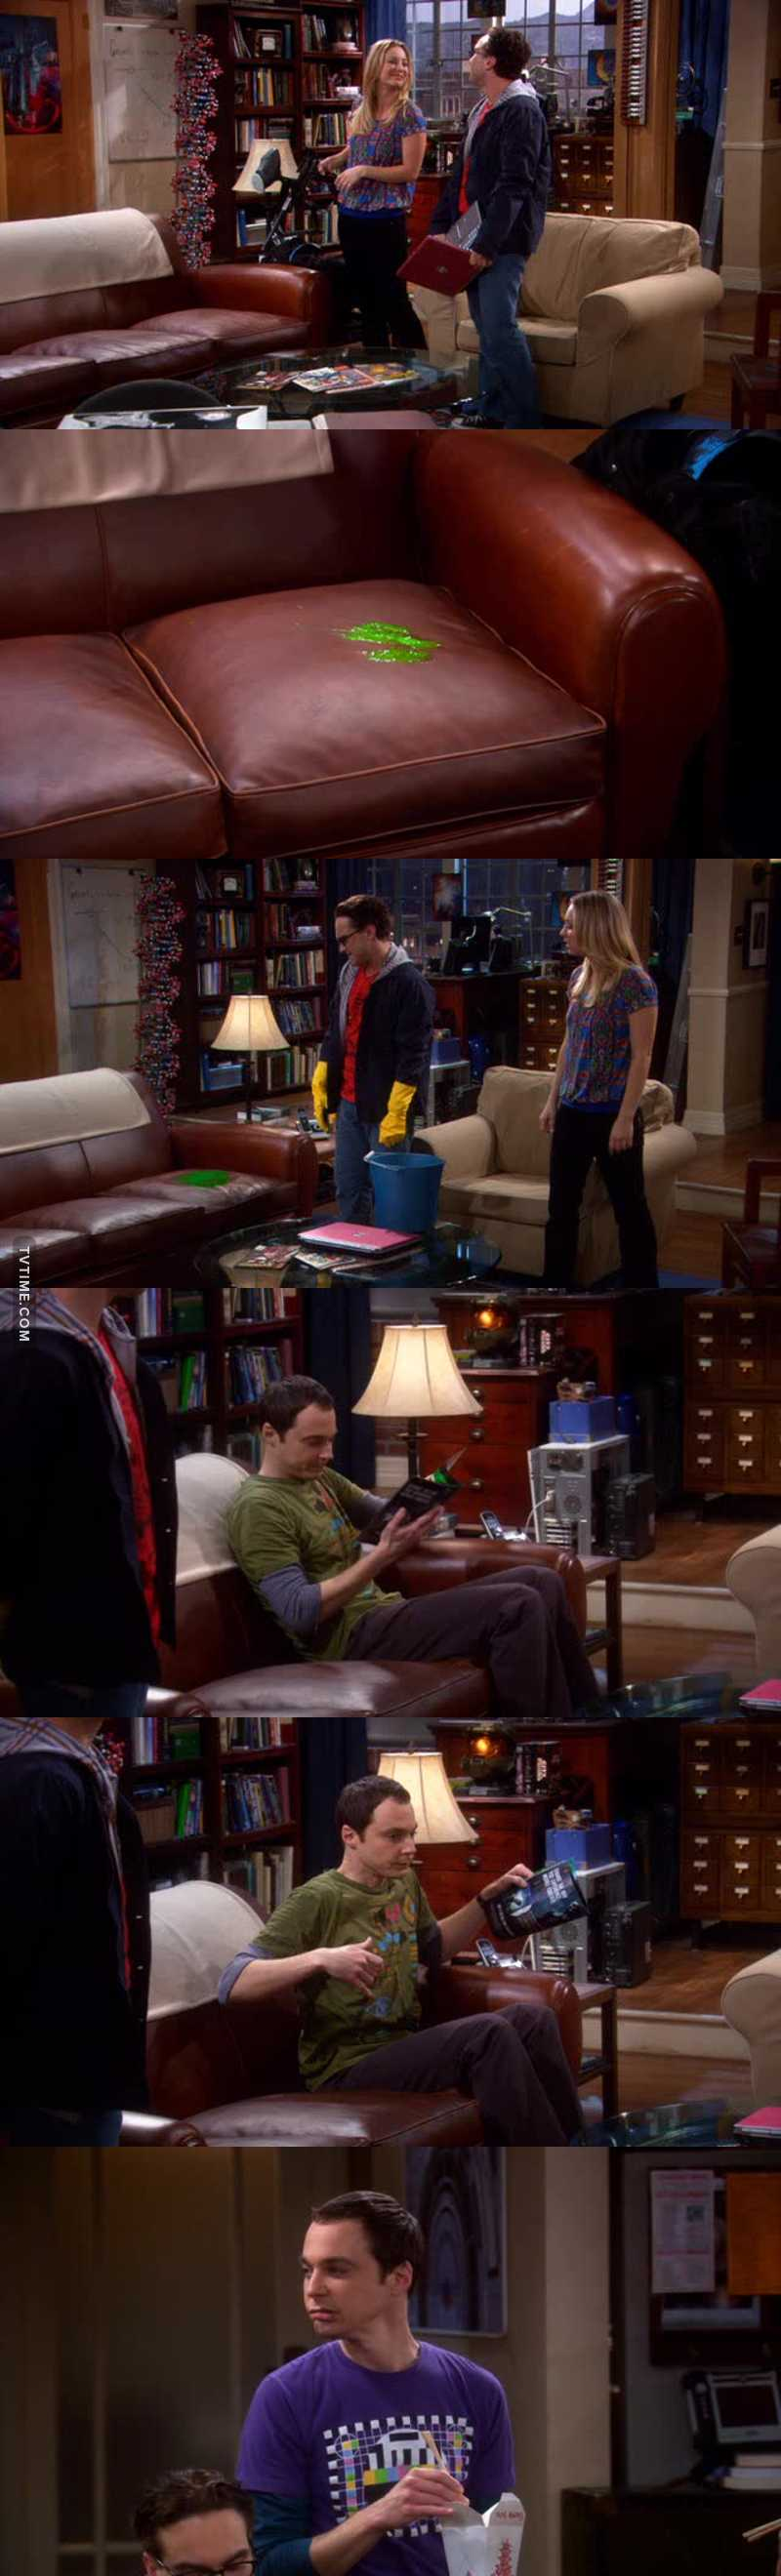 Sheldon and his spot.. 🤣🤣